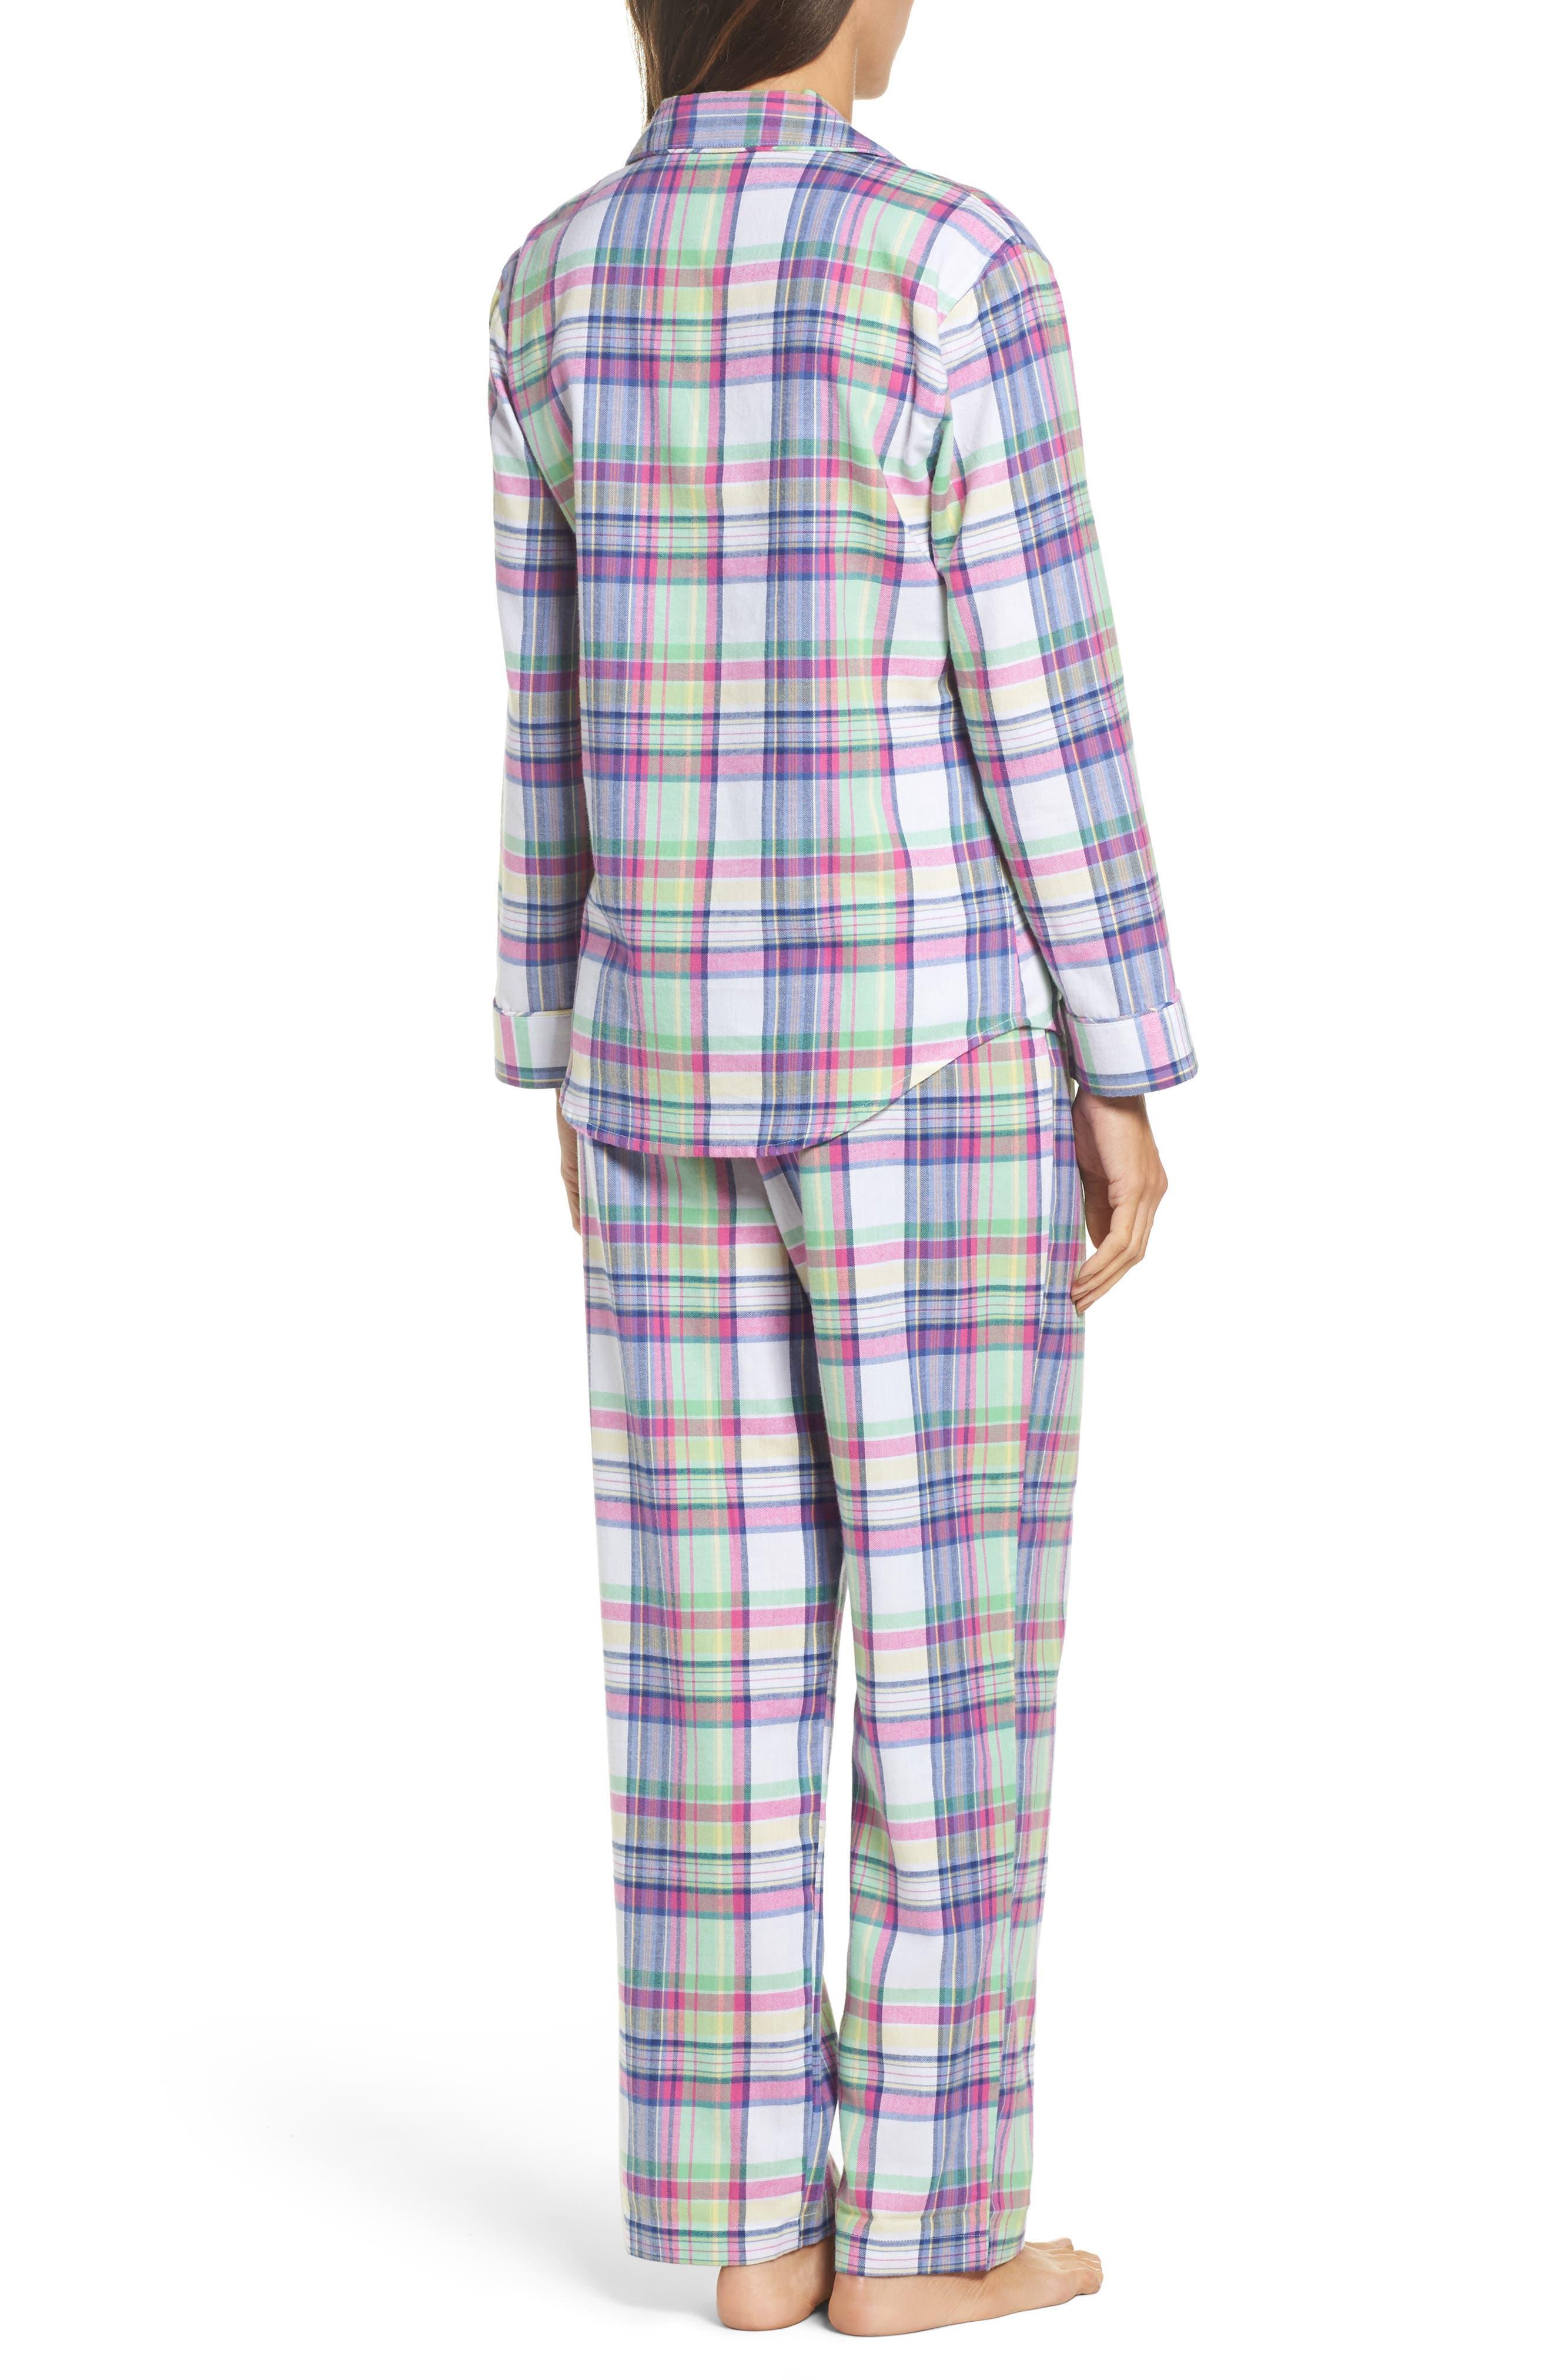 Notch Collar Pajamas,                             Alternate thumbnail 2, color,                             304